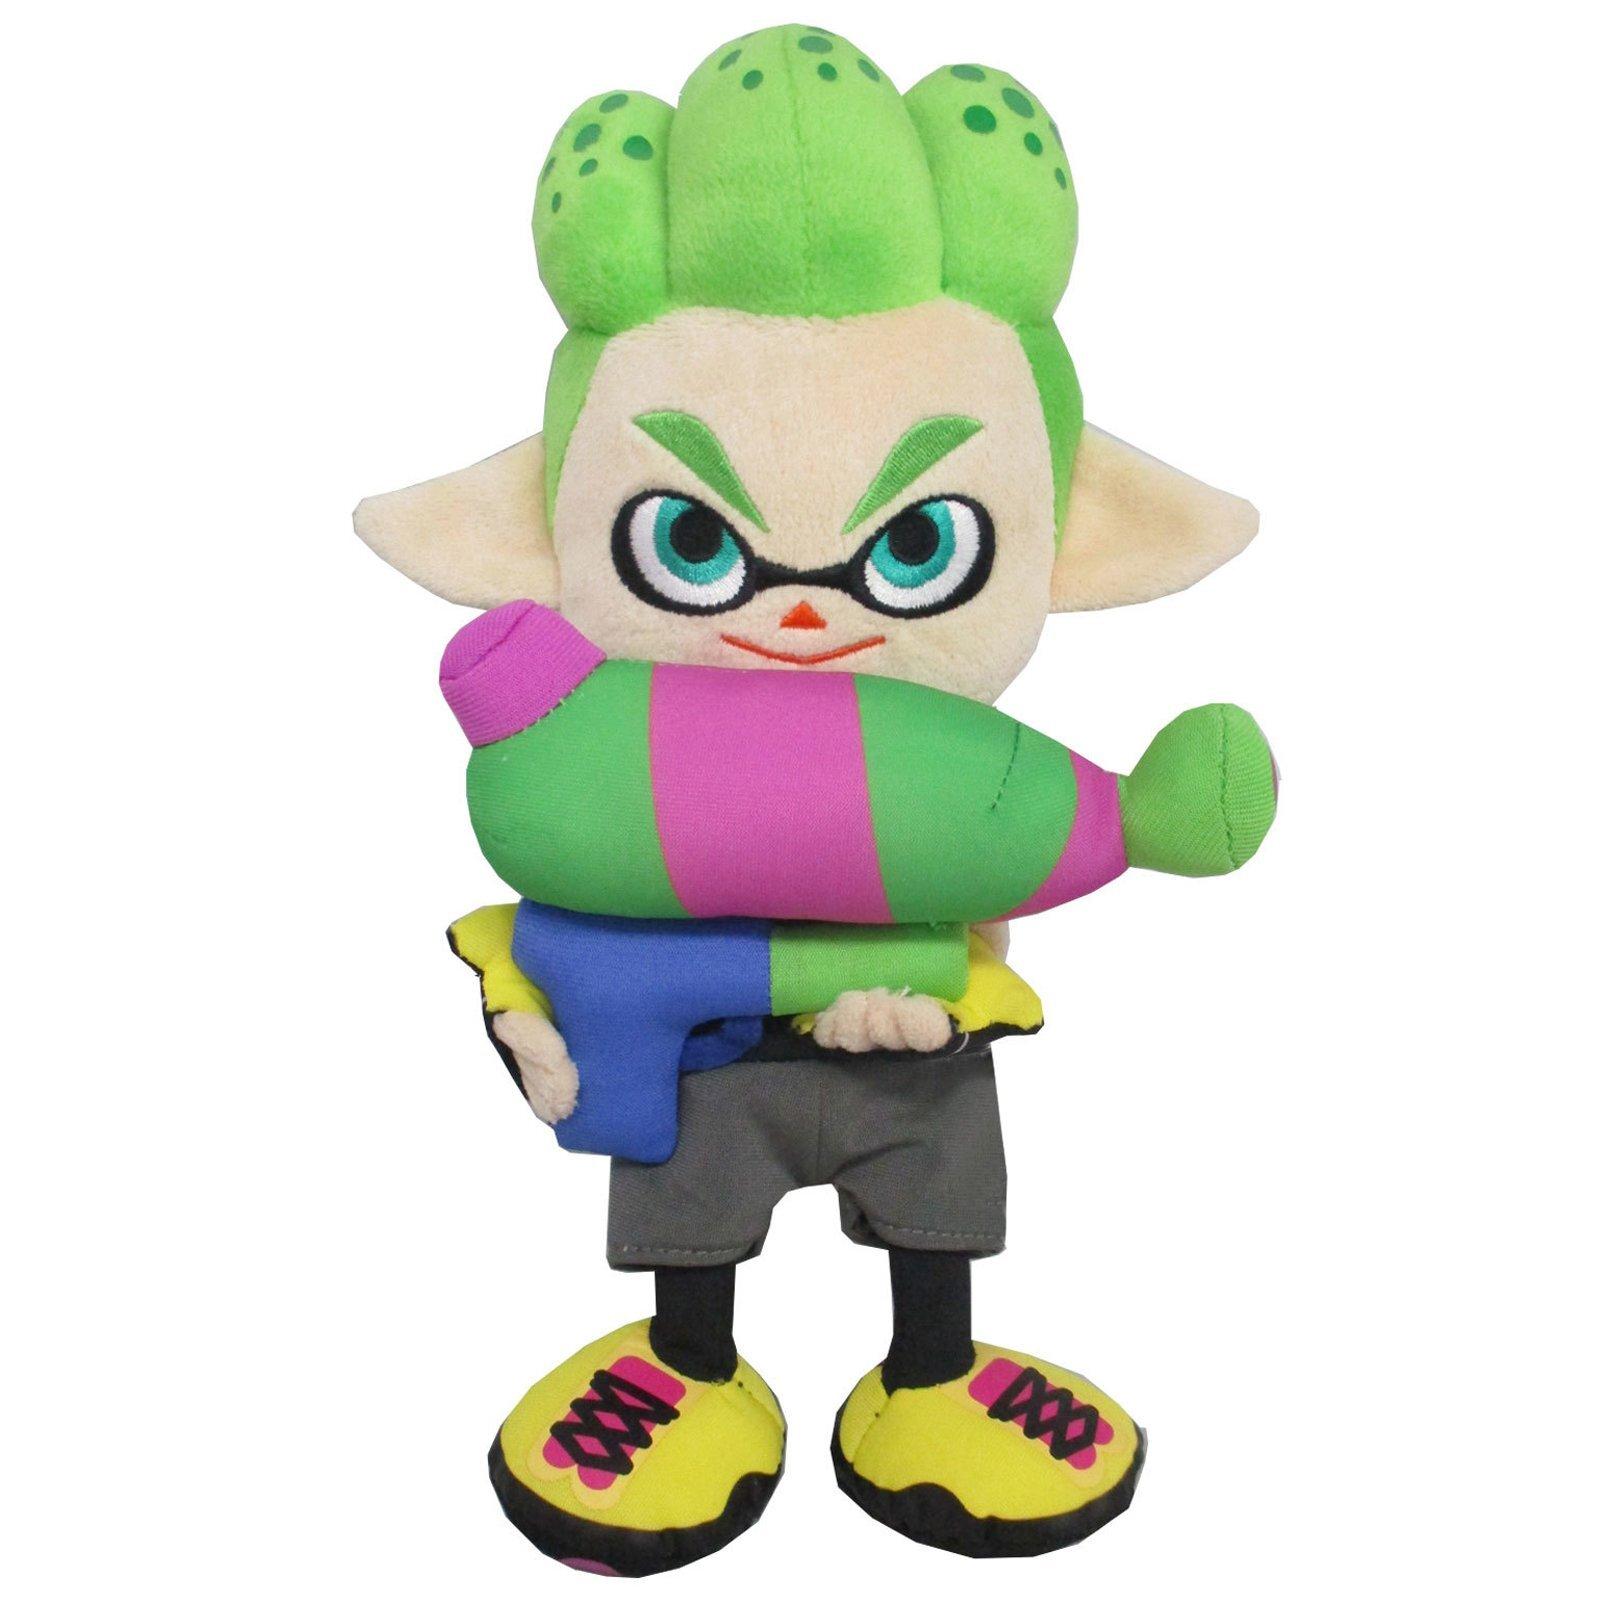 neon-green-inkling-boy-splatoon-2-plush (1)